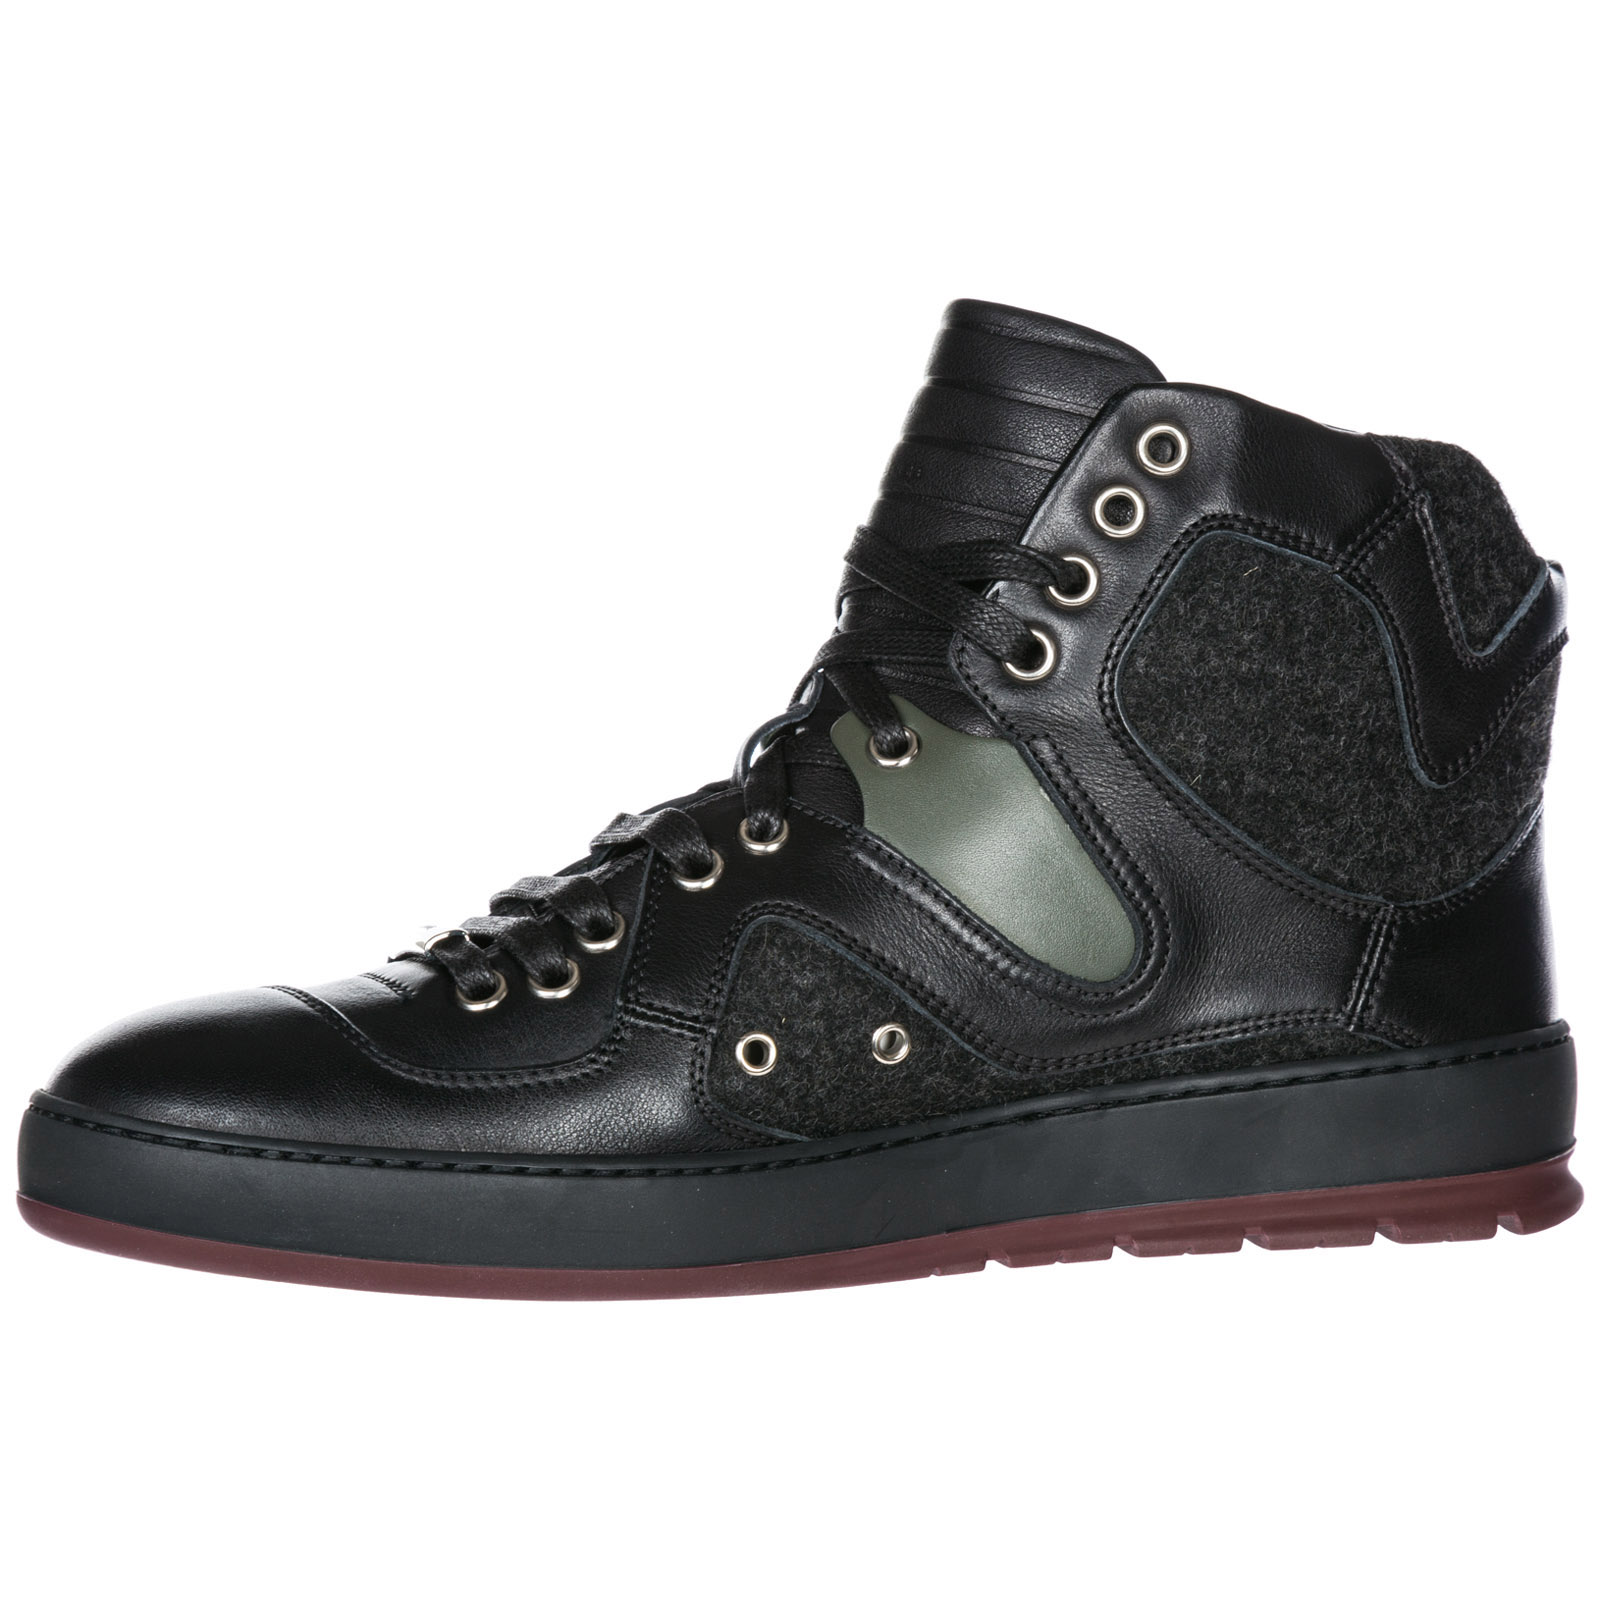 Scarpe sneakers alte uomo in pelle b19